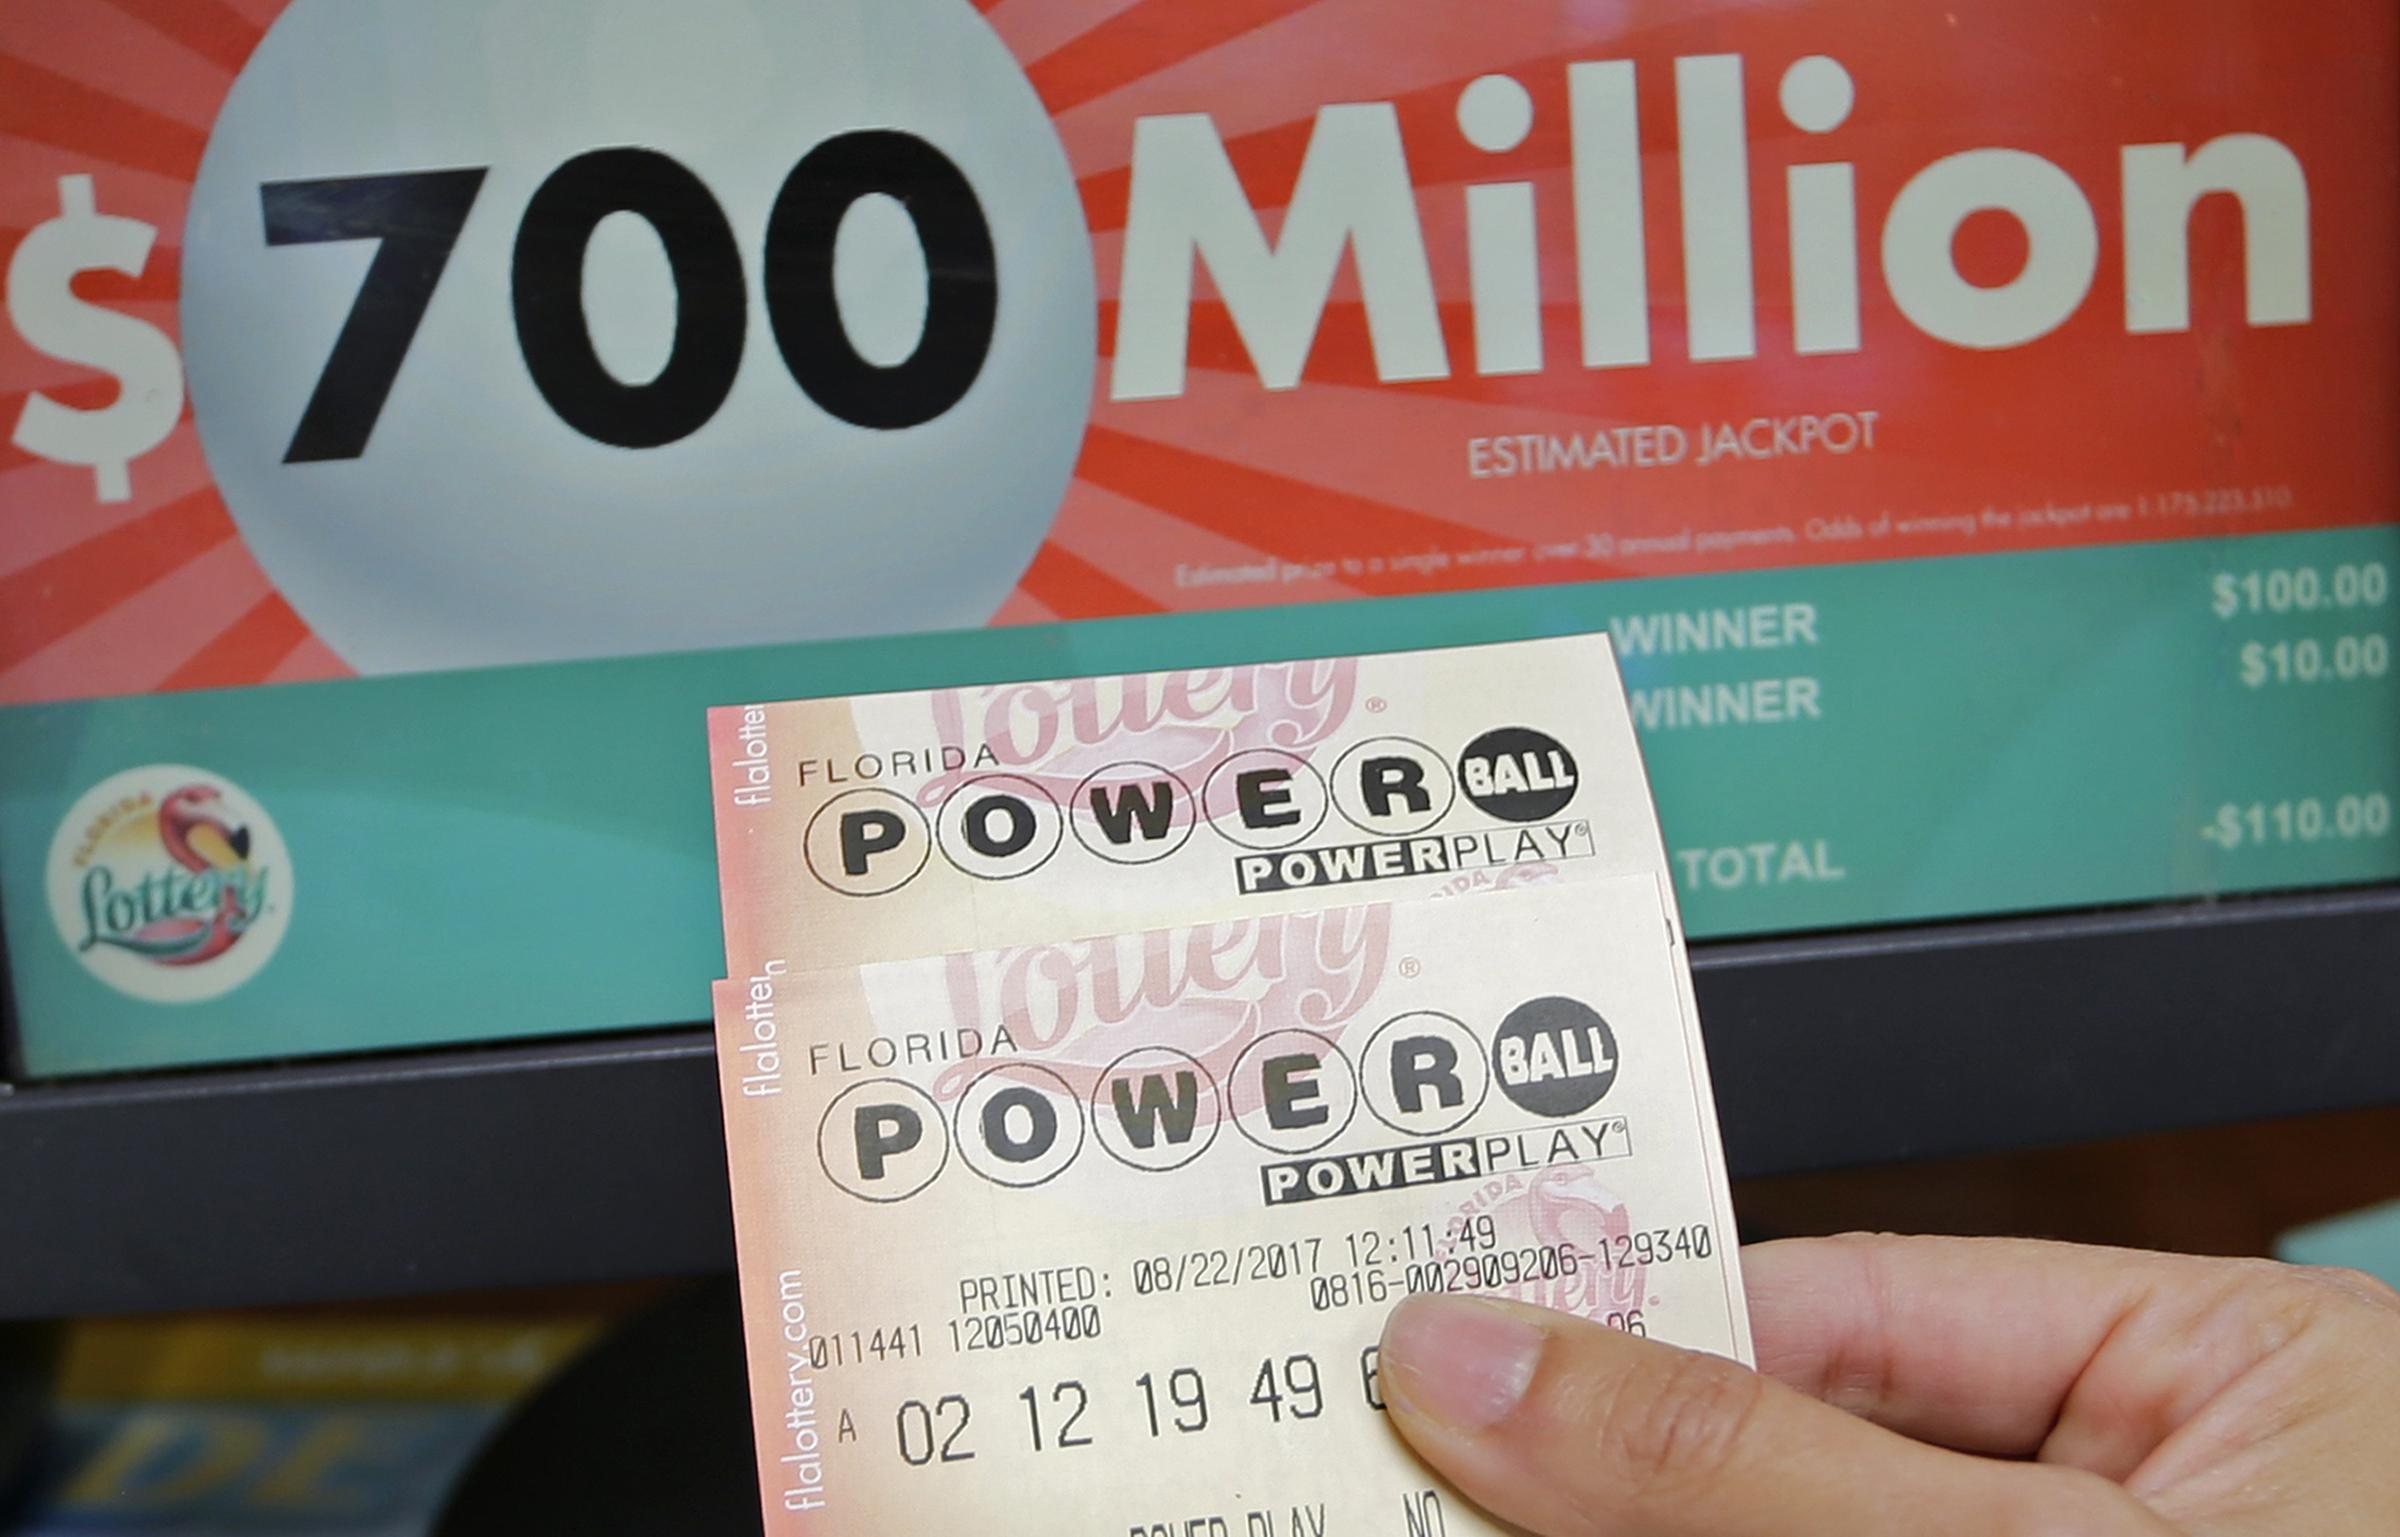 Powerball jackpot soars to $700 million